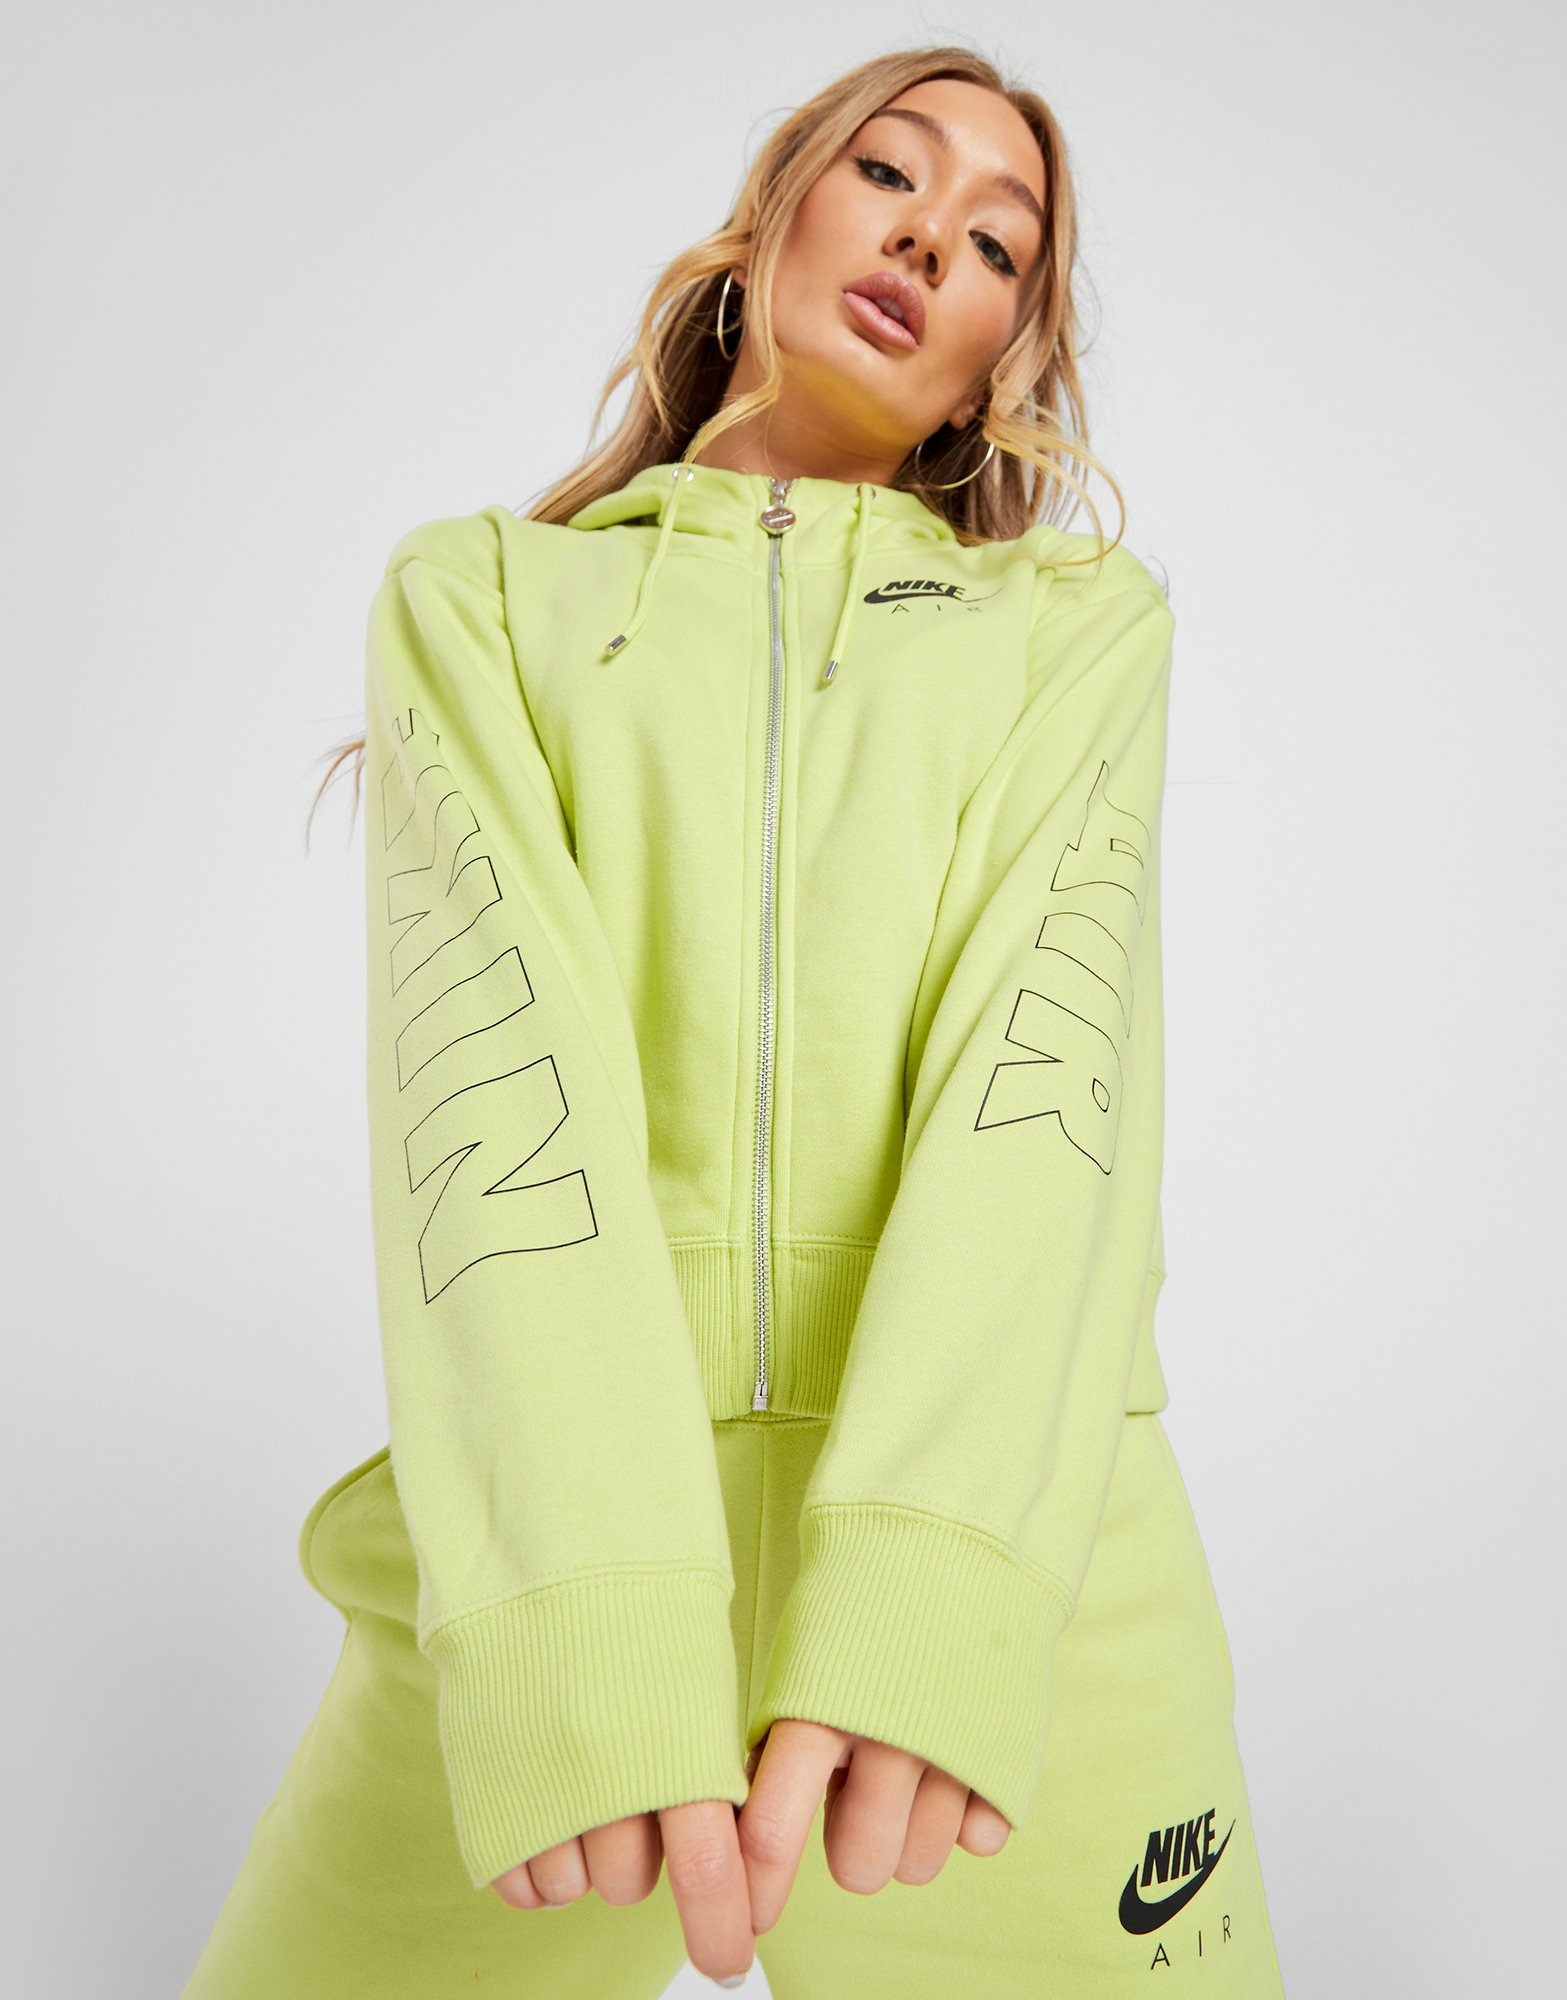 Acherter Vert Nike Sweat à capuche Full Zip Air Femme | JD